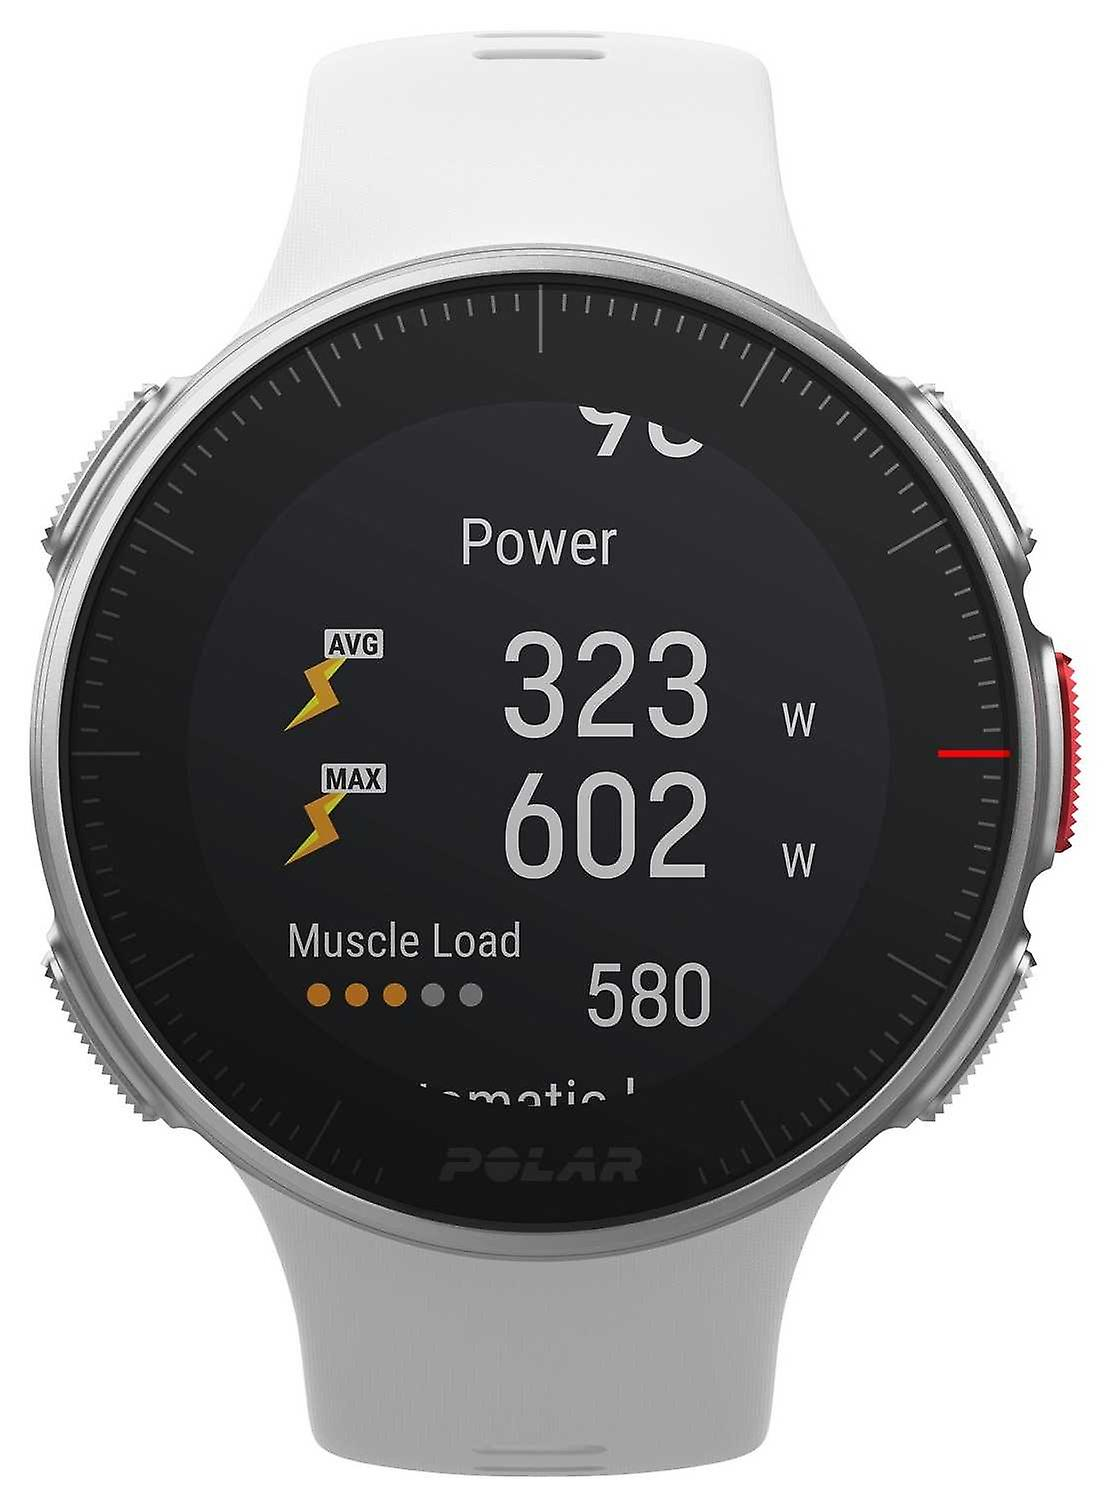 Polar Vantage V hvit GPS Multisport Premium trening HR 90070736 se